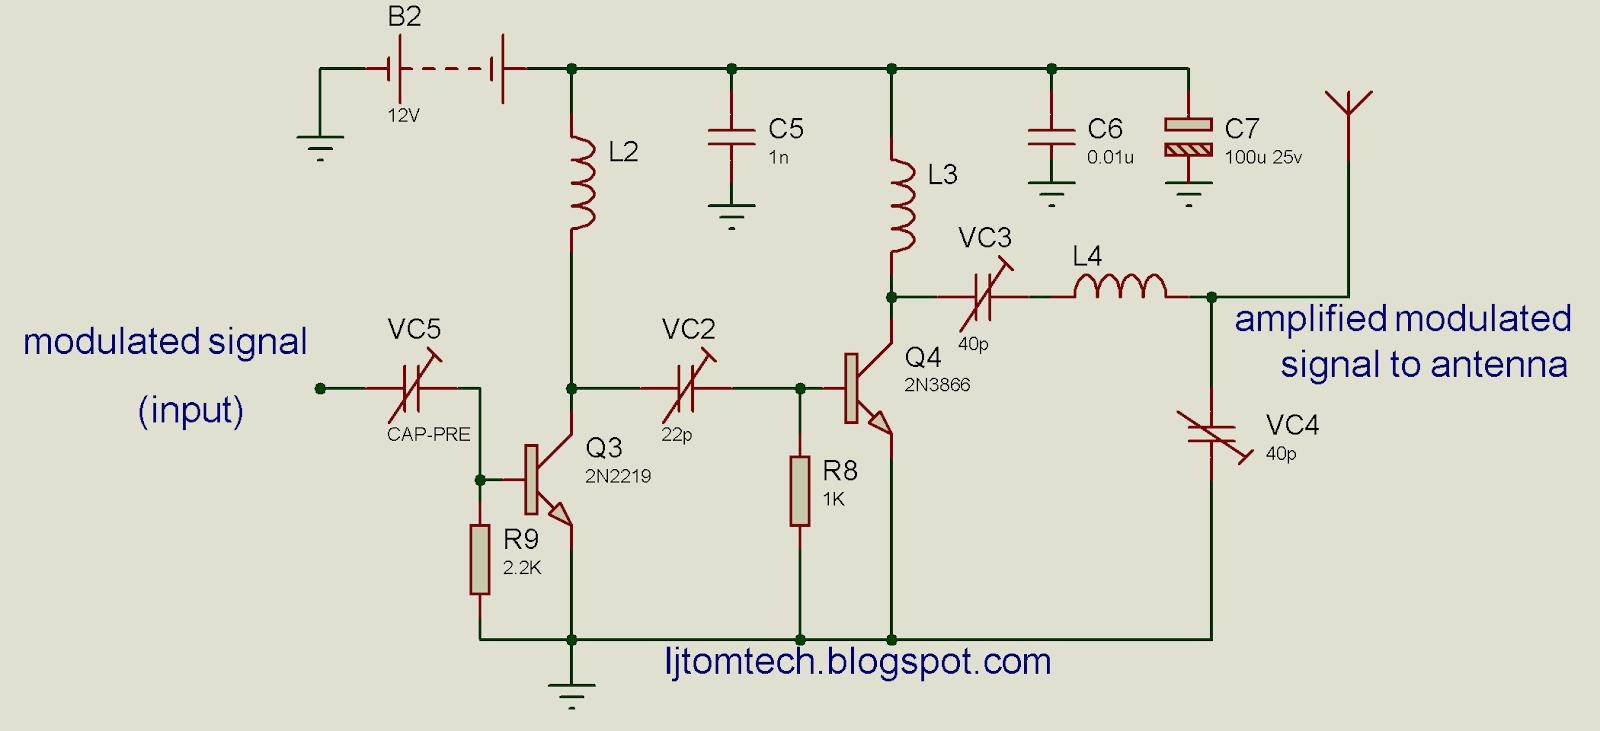 Ijtomtech Engineering Watt Fm Transmitter Circuit Diagram Signal Amplifier